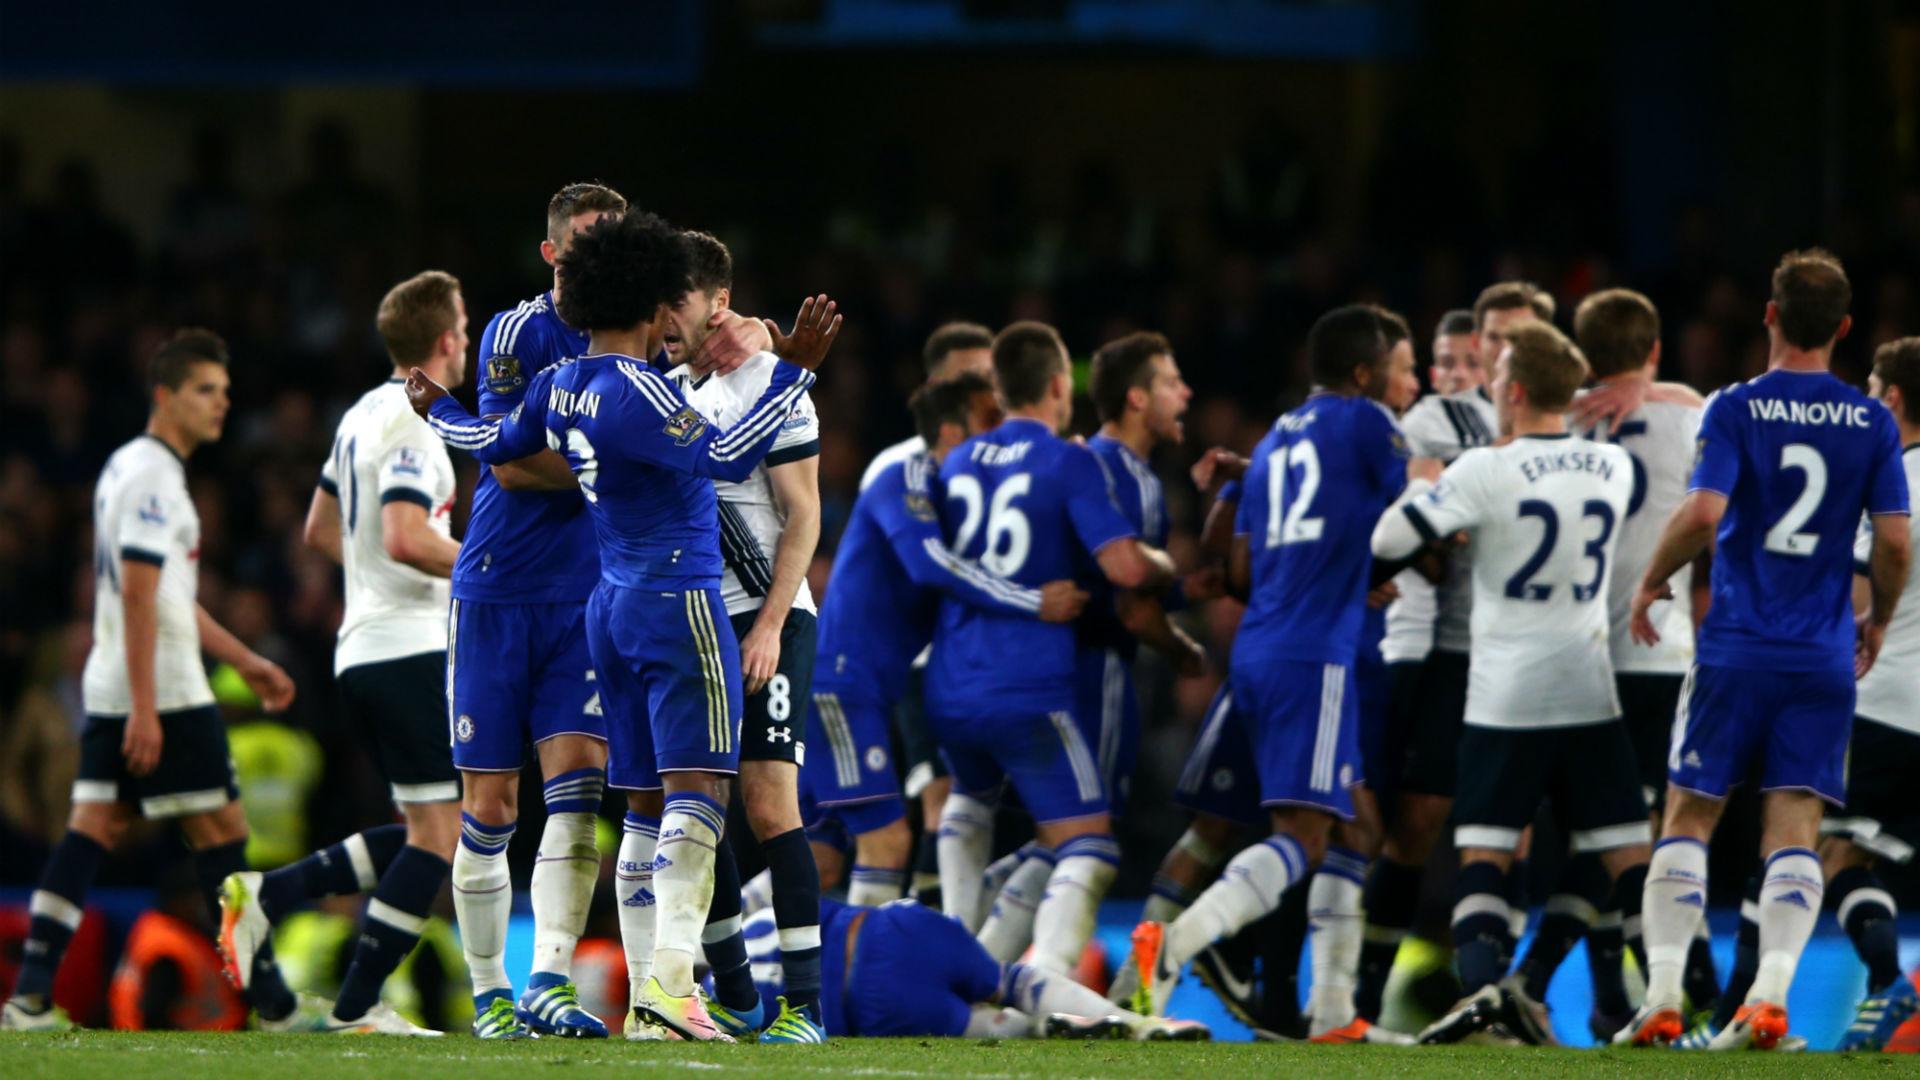 Mark Clattenburg defends his controversial comments about Chelsea v Spurs